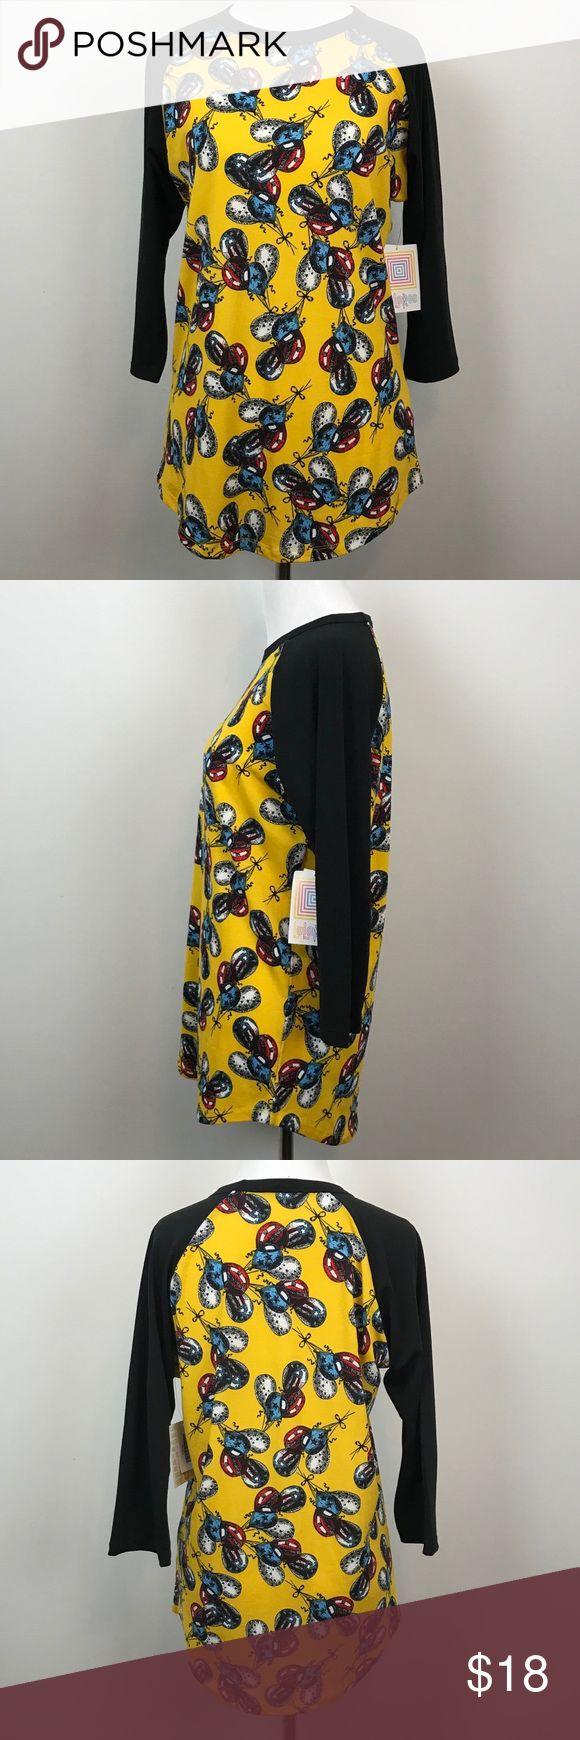 "LuLaroe Woman Size S Randy Raglan Yellow Balloon Machine washable.  3/4 Sleeve   Measures-  20"" armpit to armpit  26"" length  15"" sleeve LuLaRoe Tops Tees - Long Sleeve"